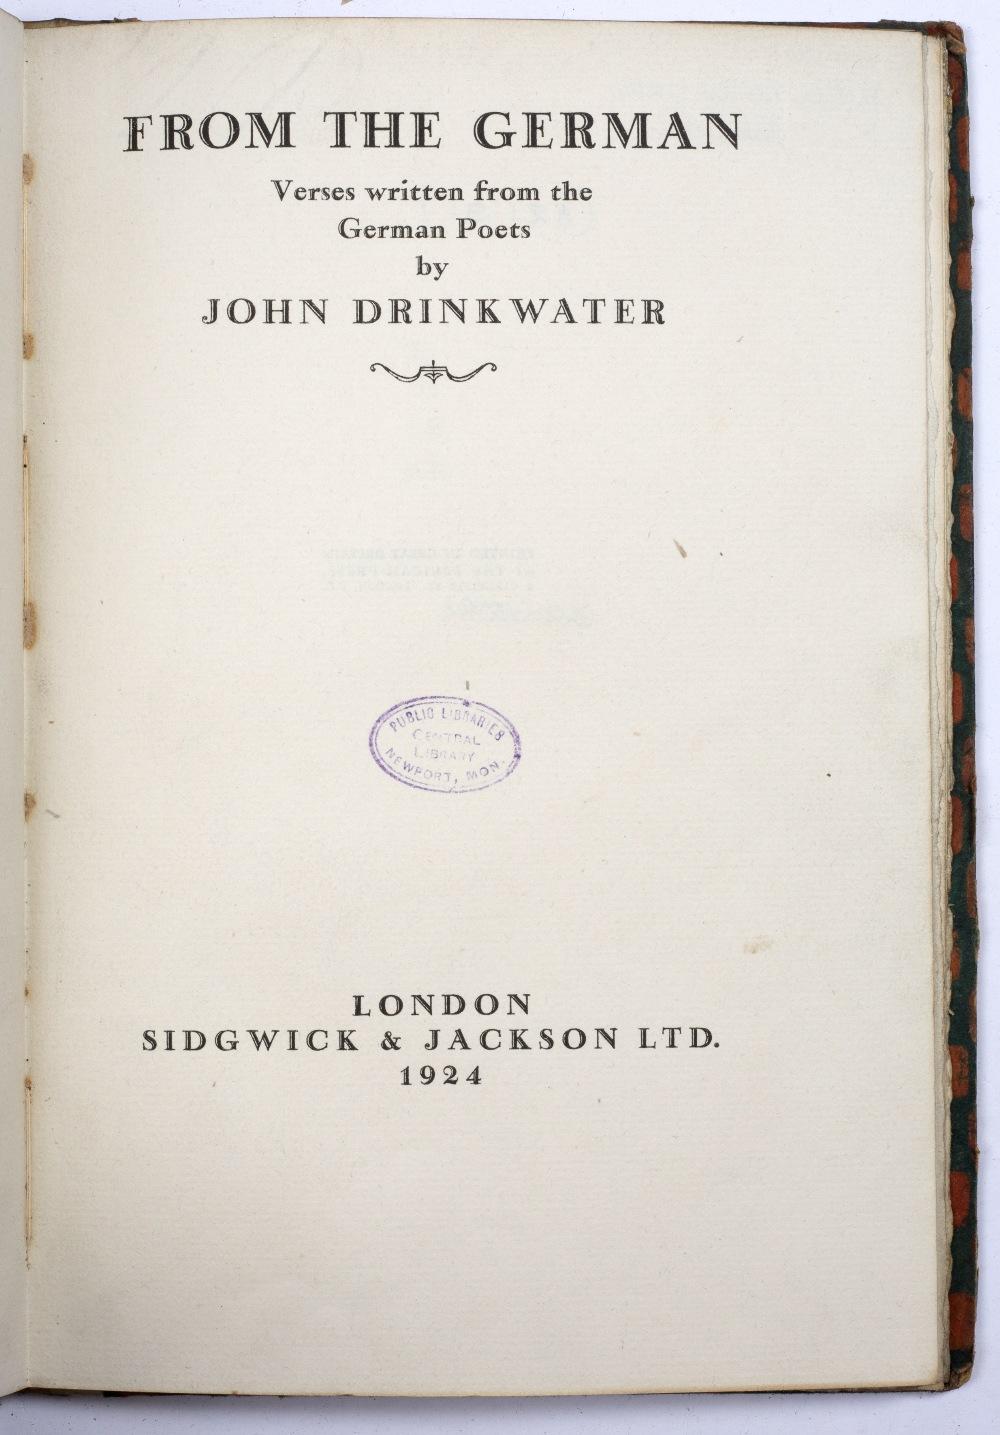 GRAVES, Robert (1895-1985), English Poet Poems (1914-1926), Heinemann, London 1927. B/w speckled - Image 3 of 3